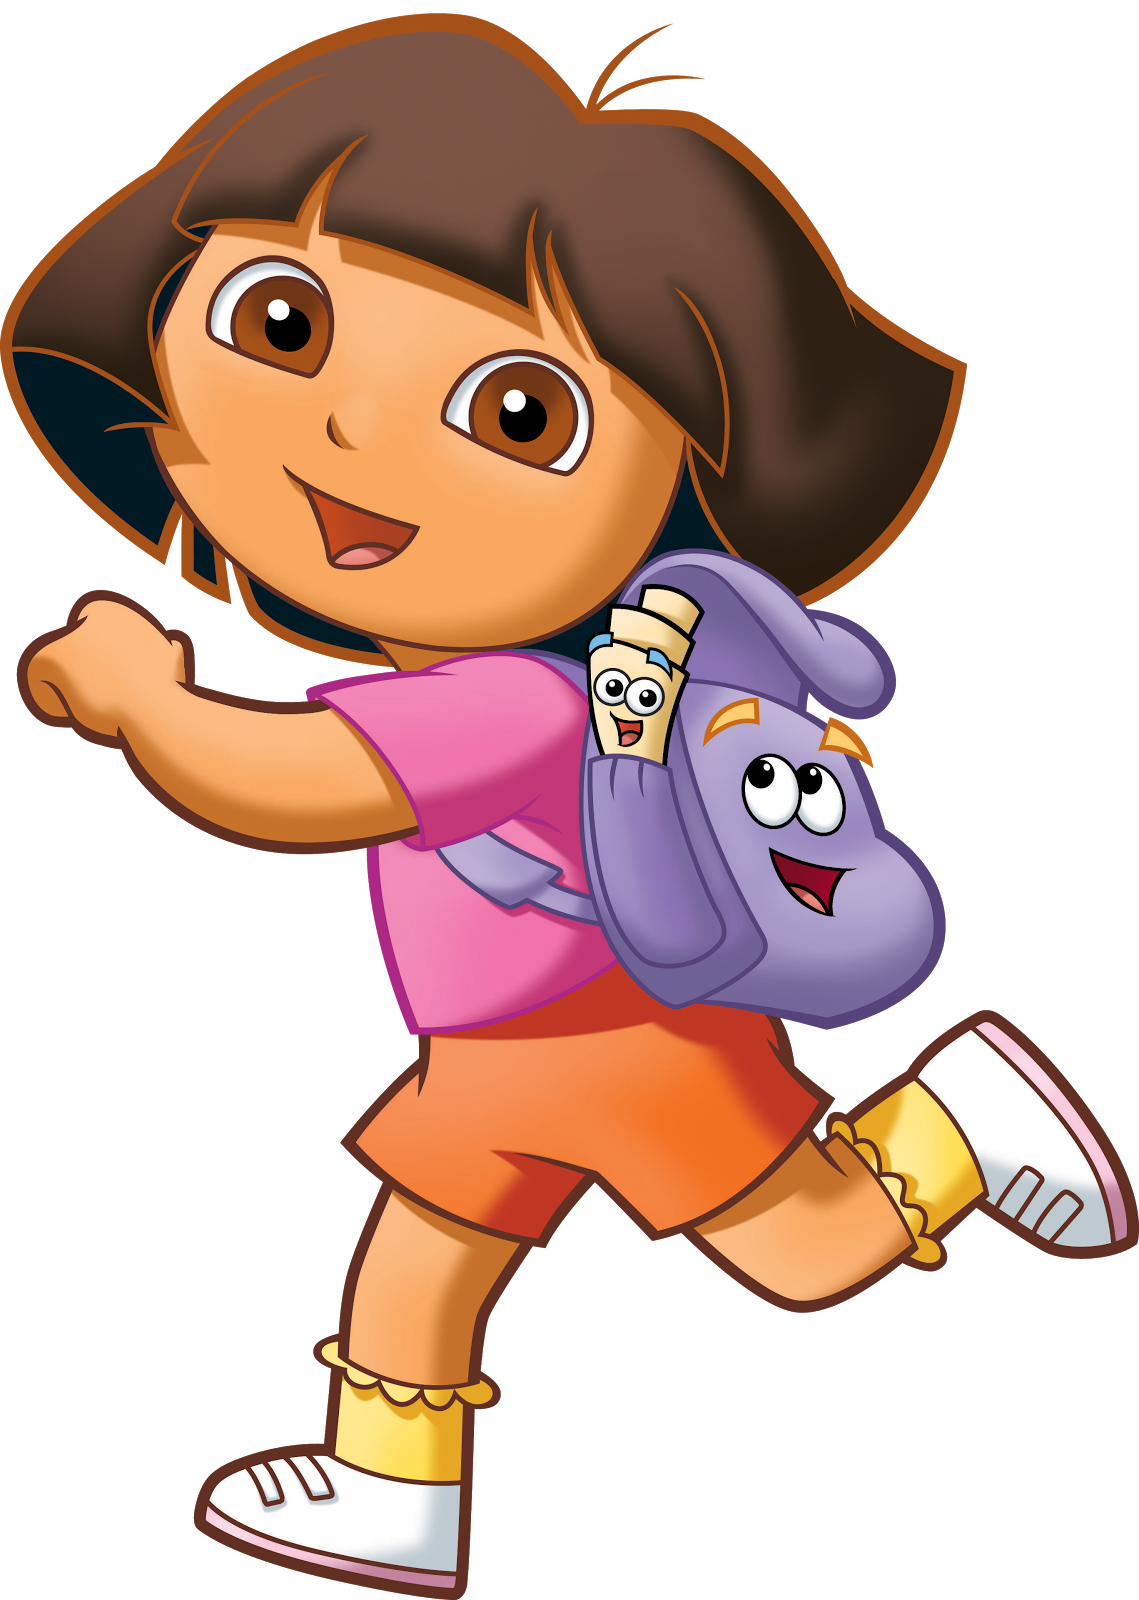 Cartoon Characters Dora The Explorer Png Pack